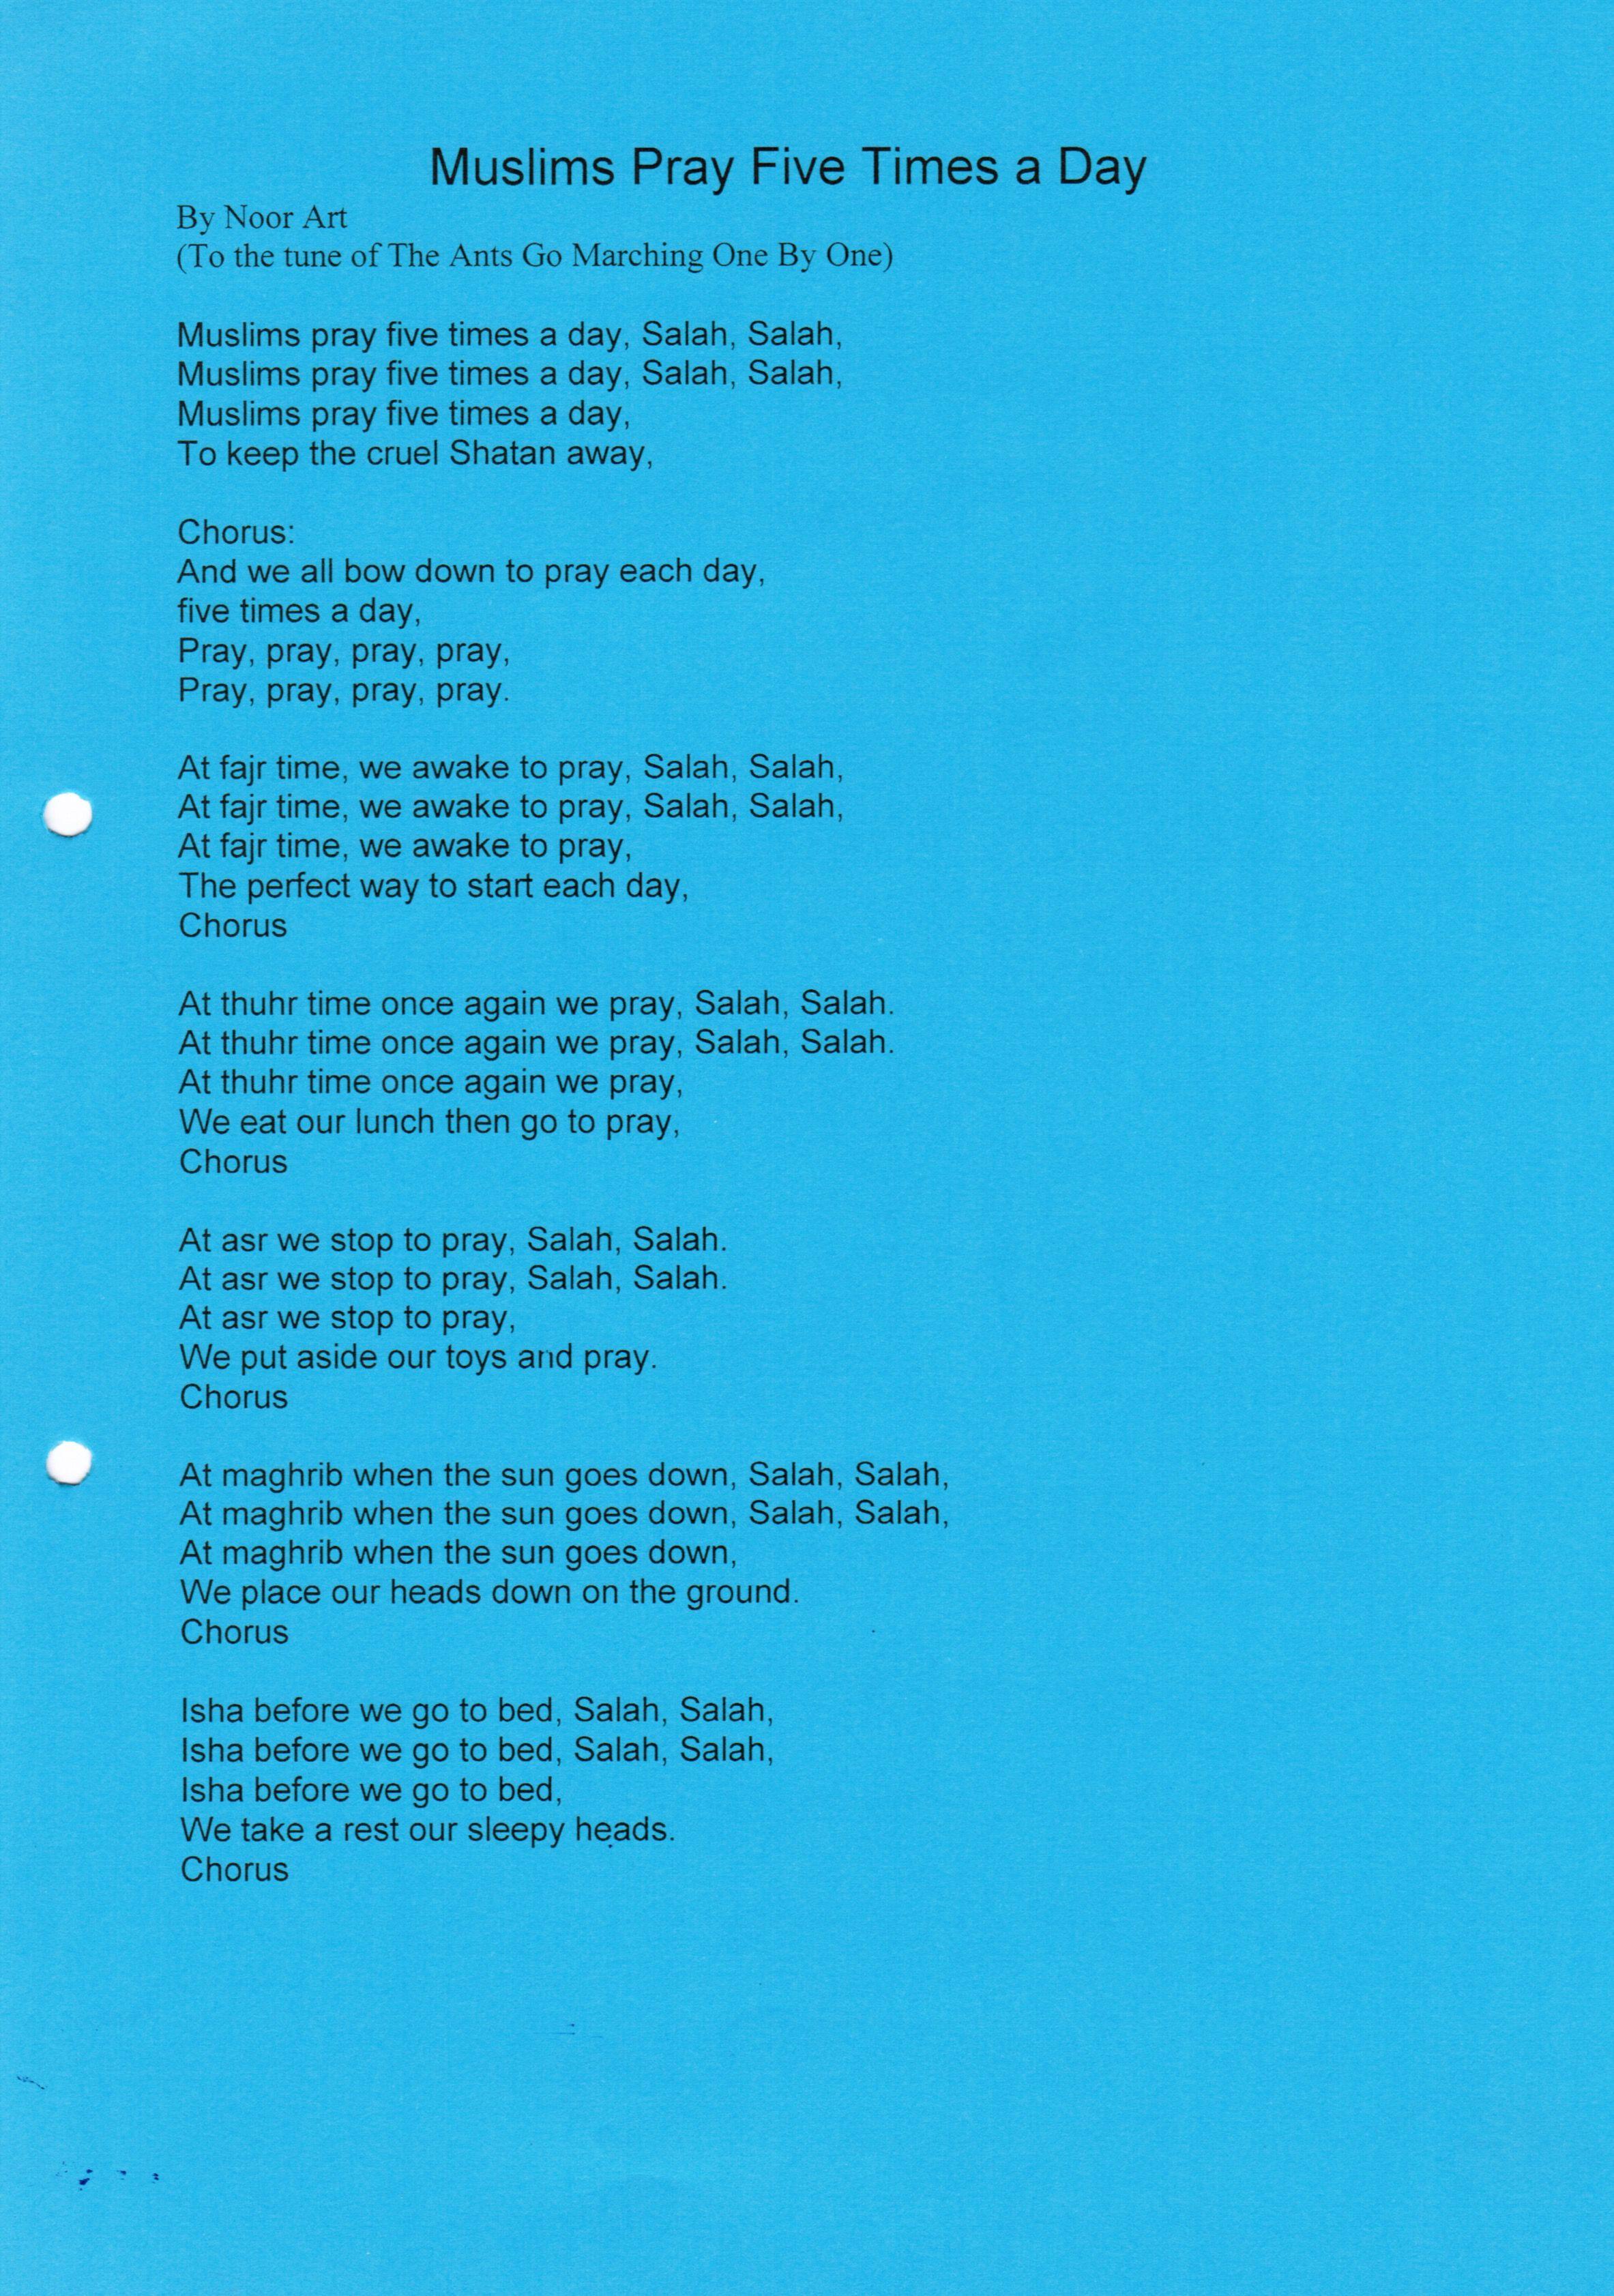 Muslims pray 5x a day song lyrics pinterest muslim and islamic islamic studies kristyandbryce Choice Image